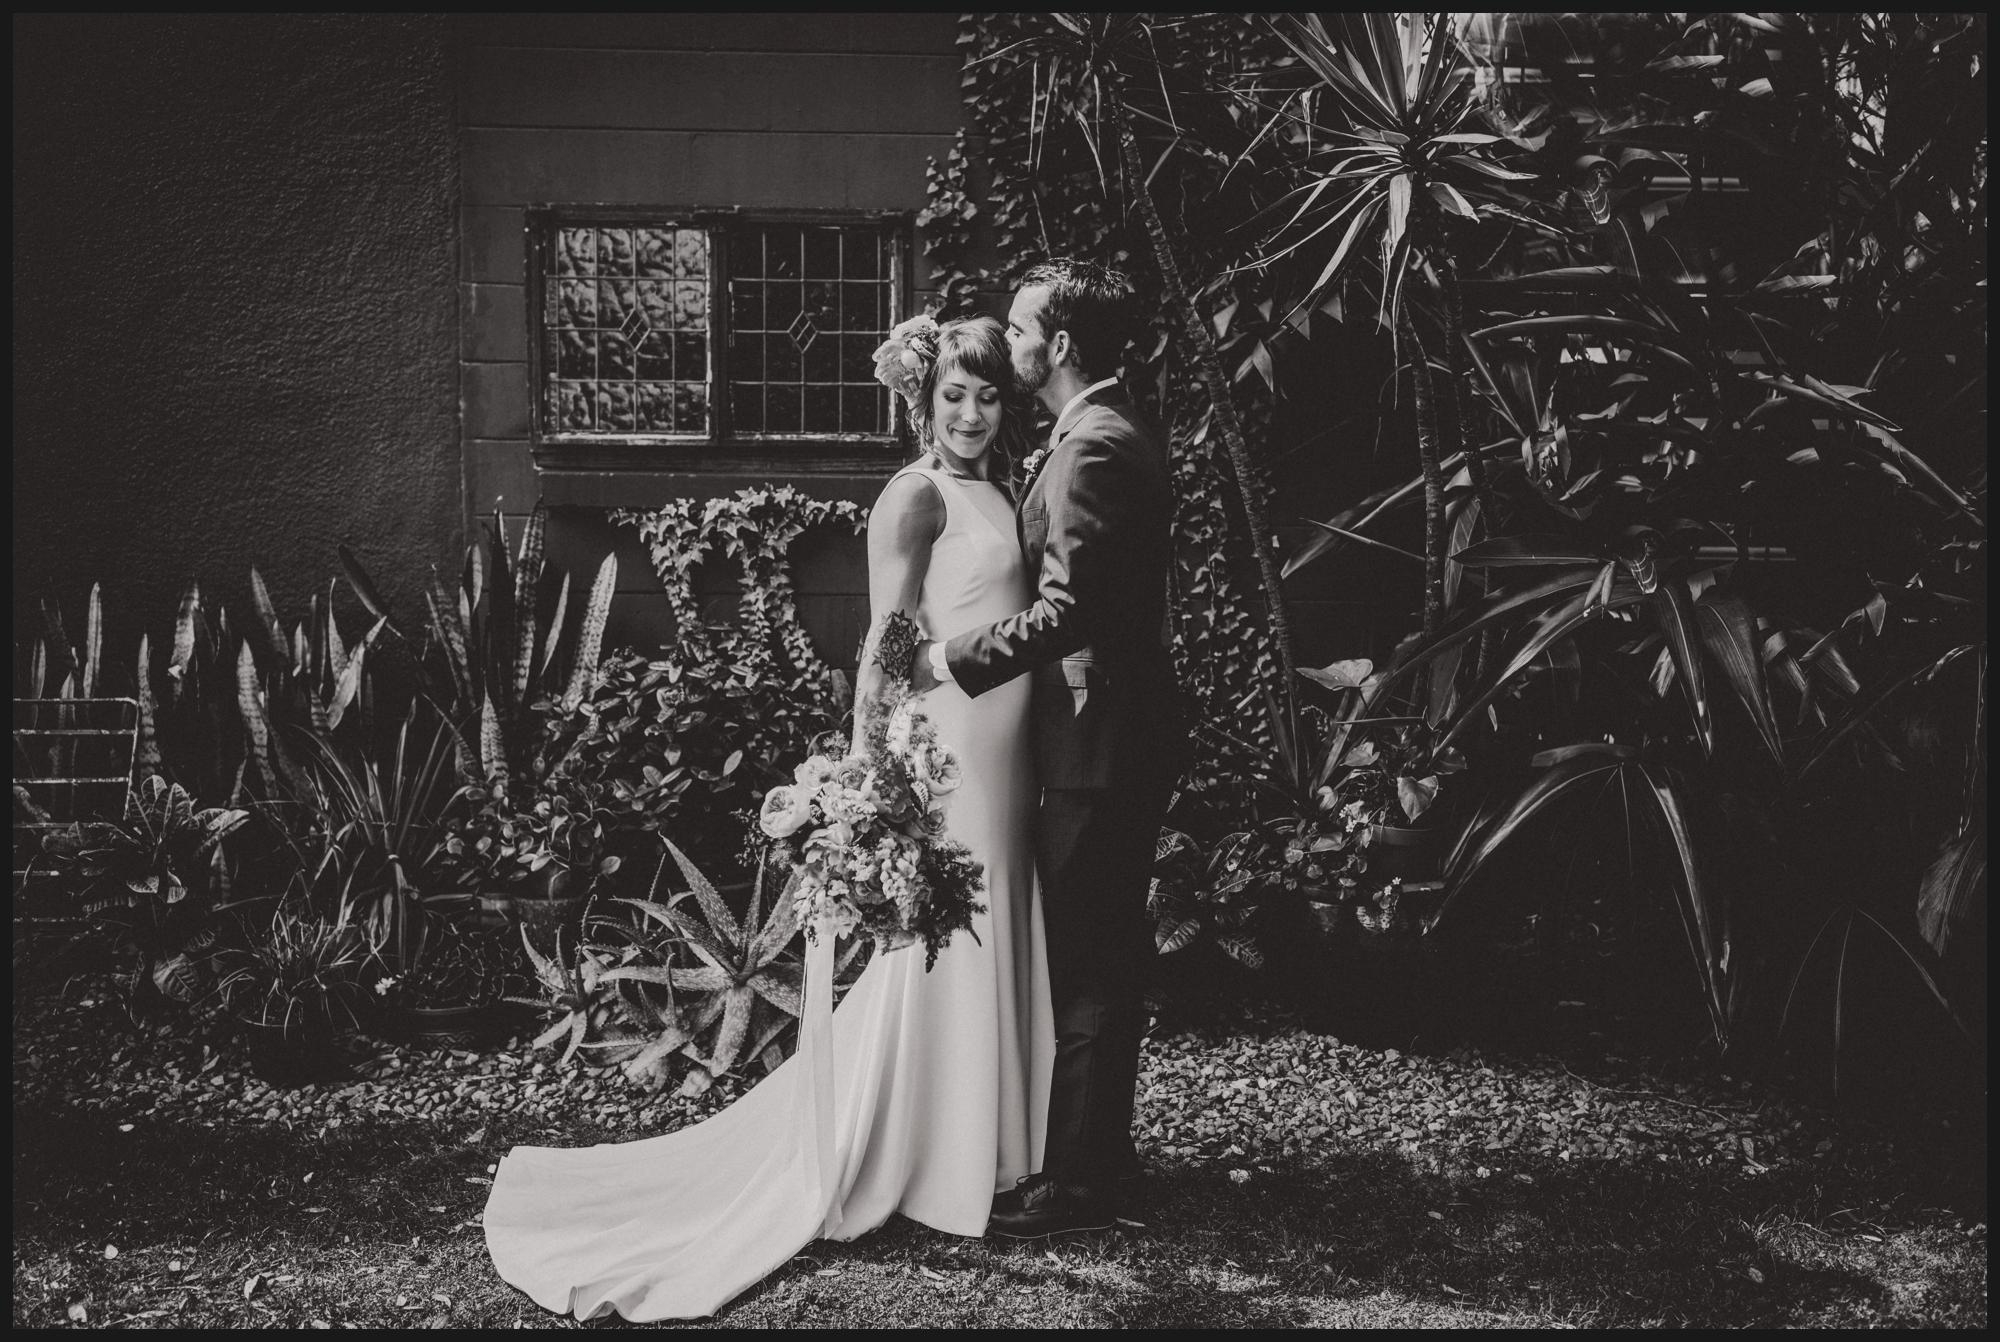 Orlando-Wedding-Photographer-destination-wedding-photographer-florida-wedding-photographer-bohemian-wedding-photographer_1975.jpg